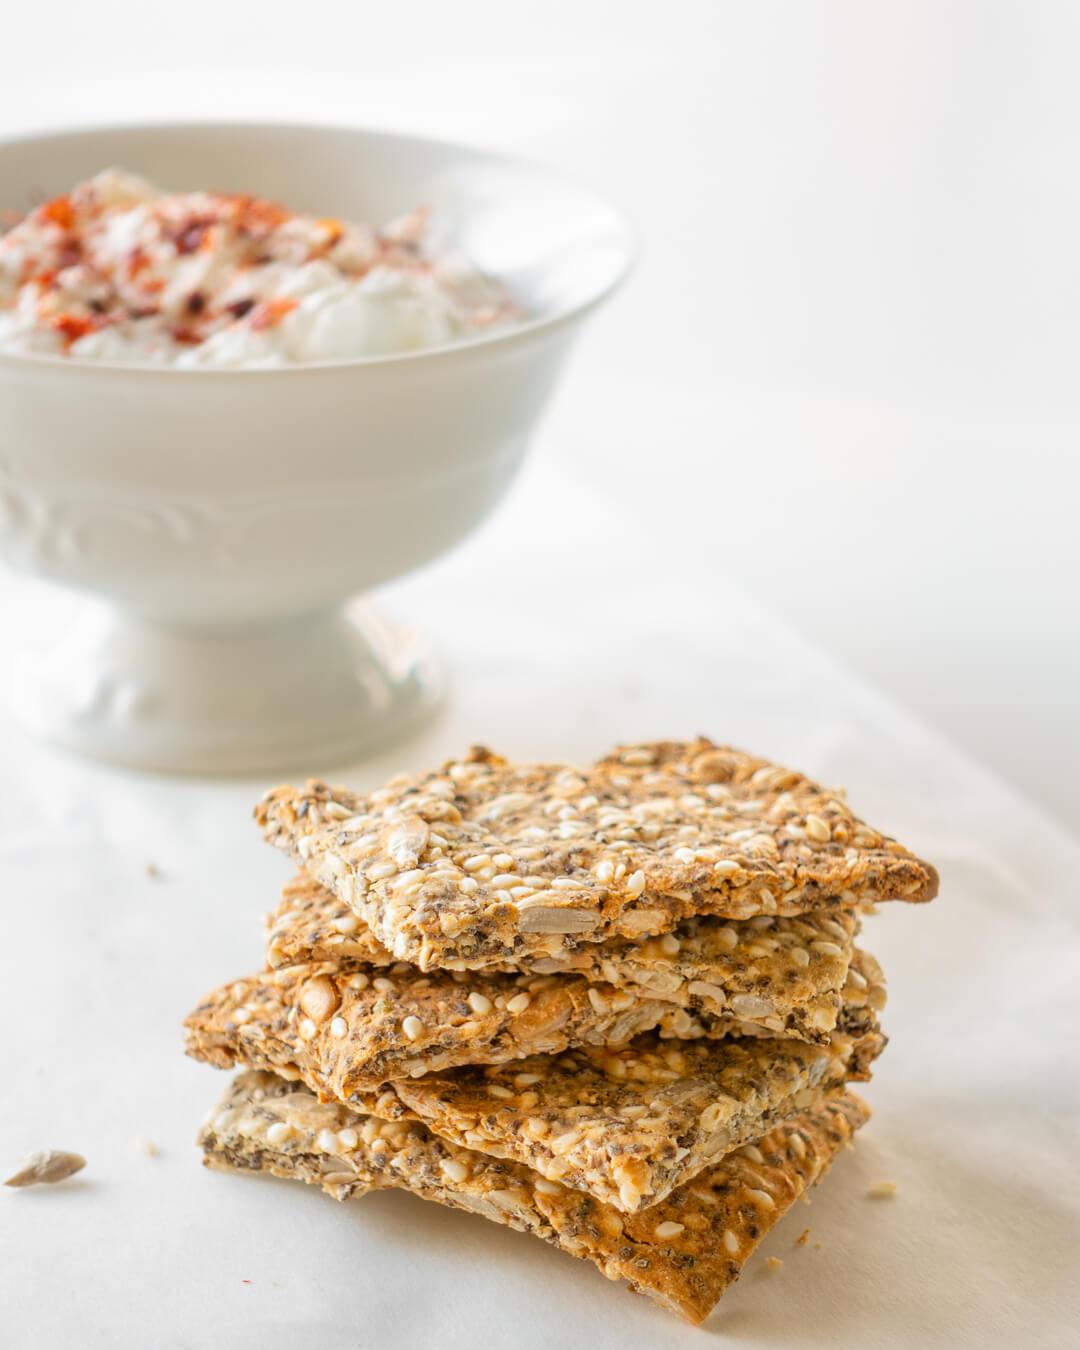 Krekerji iz semen z namazom